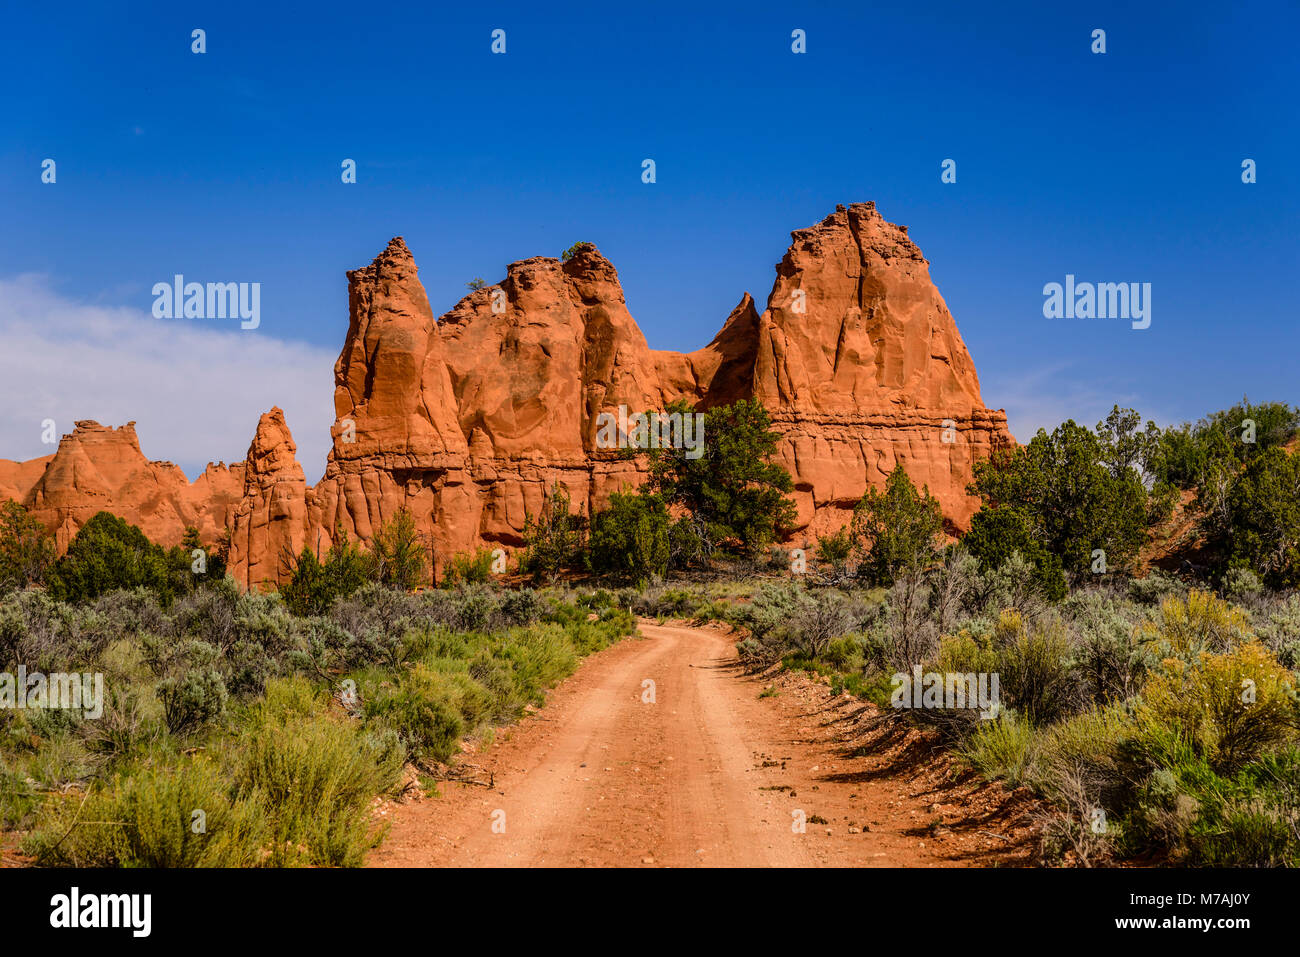 The USA, Utah, Kane County, Kodachrome Basin State Park, Gravel Road - Stock Image